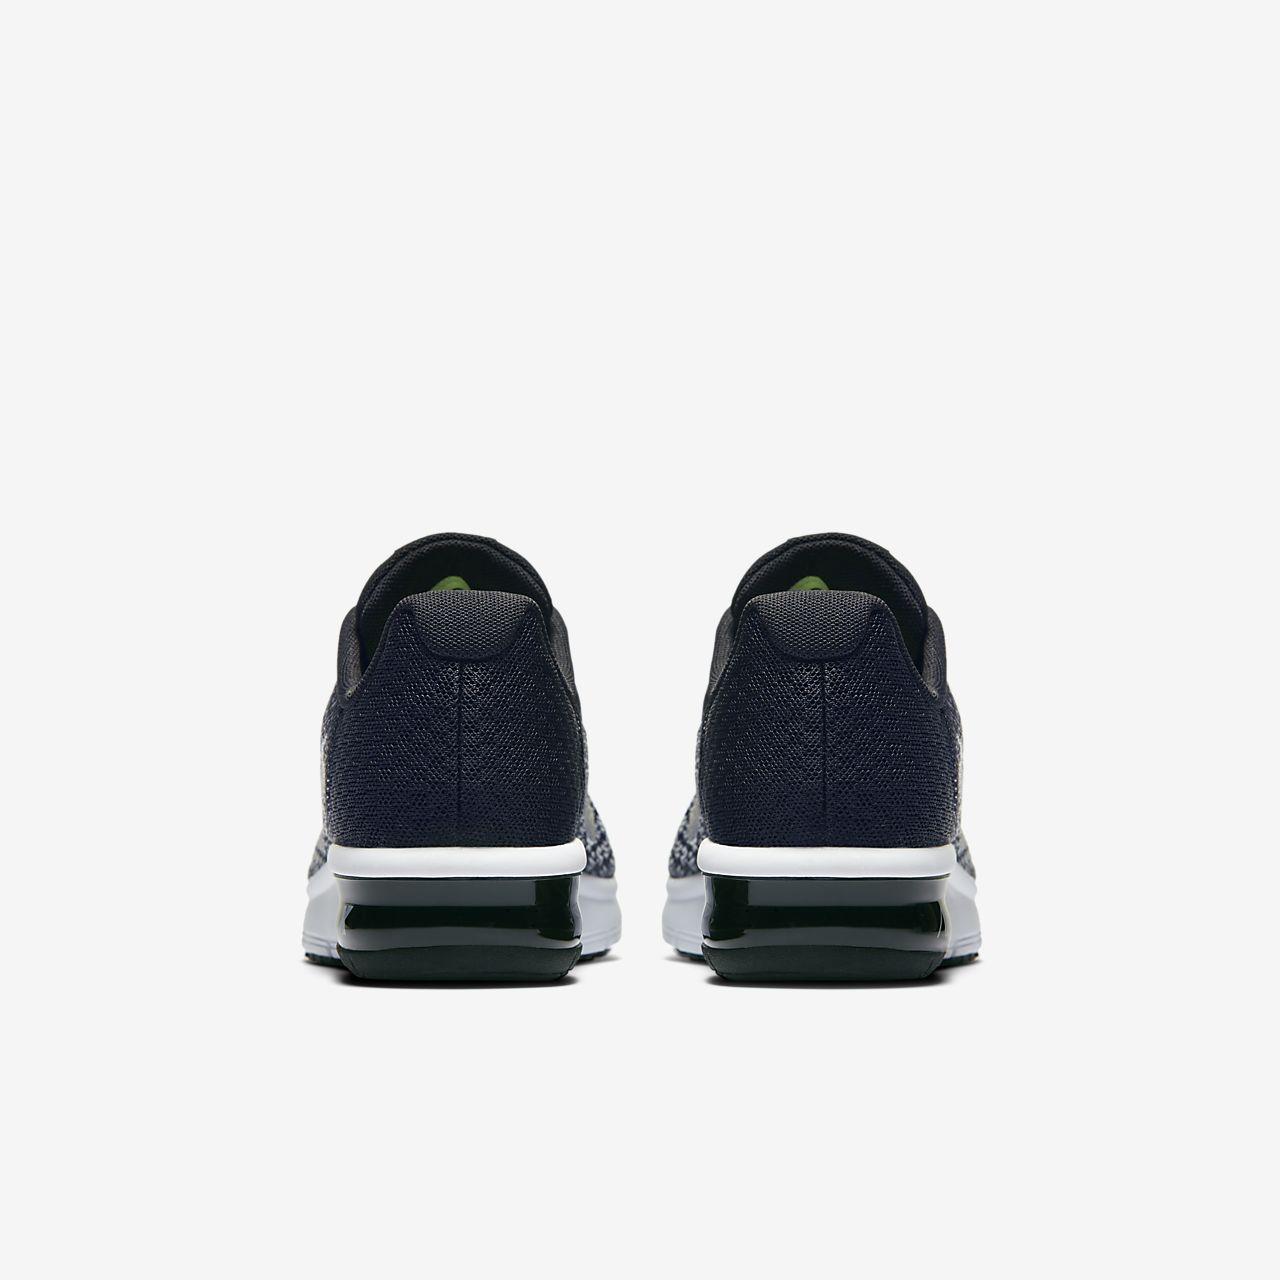 681df418fe512 Nike Air Max Sequent 2 Older Kids  Running Shoe. Nike.com AU